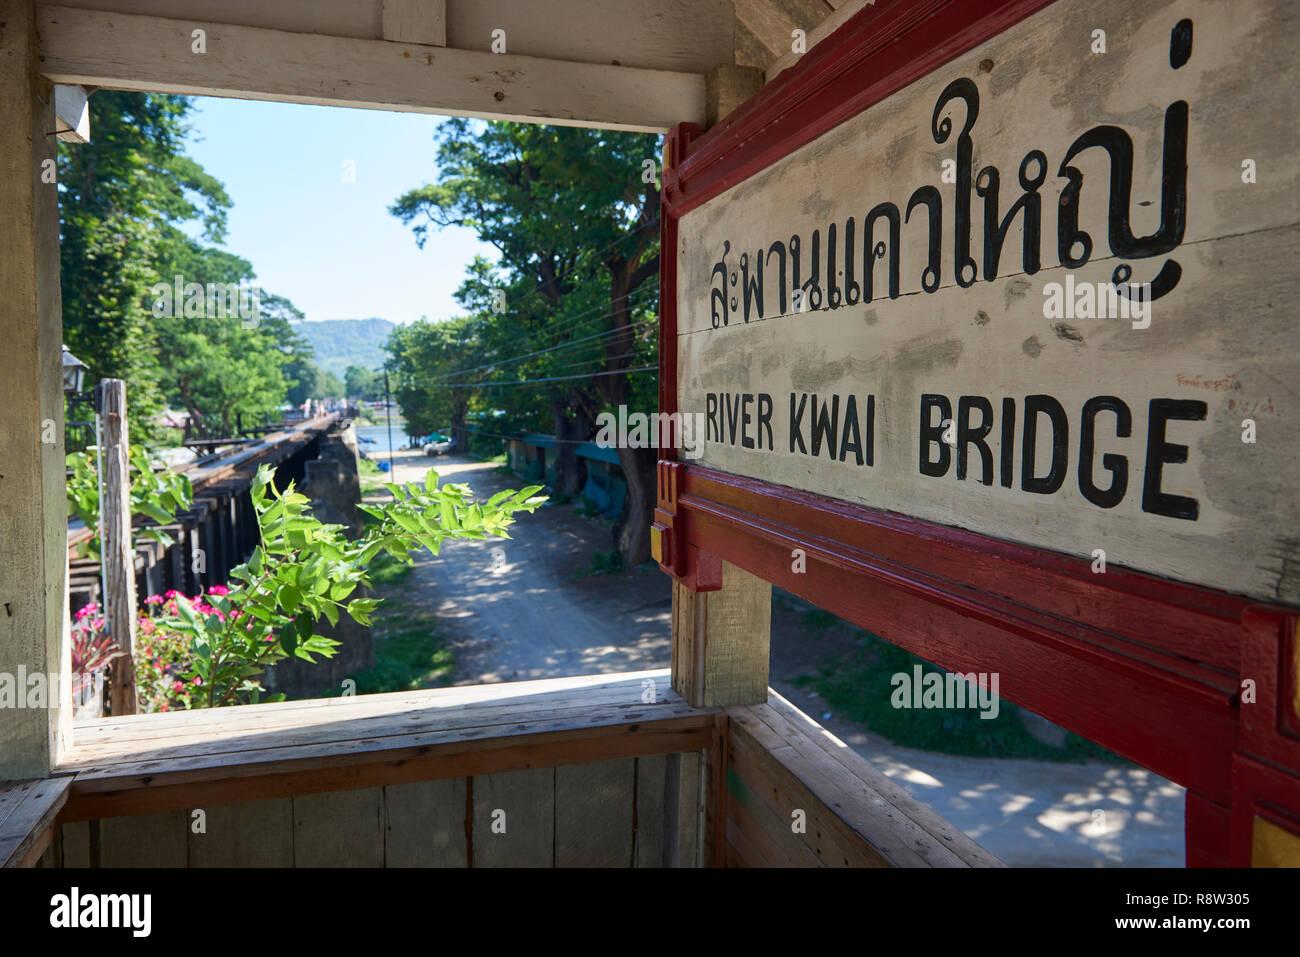 Old waiting gazibo of the Siam-Burma Railway over River Kwai in Kanchanaburi, Thailand. The infamous River Kwai bridge has become a tourist destinatio Stock Photo